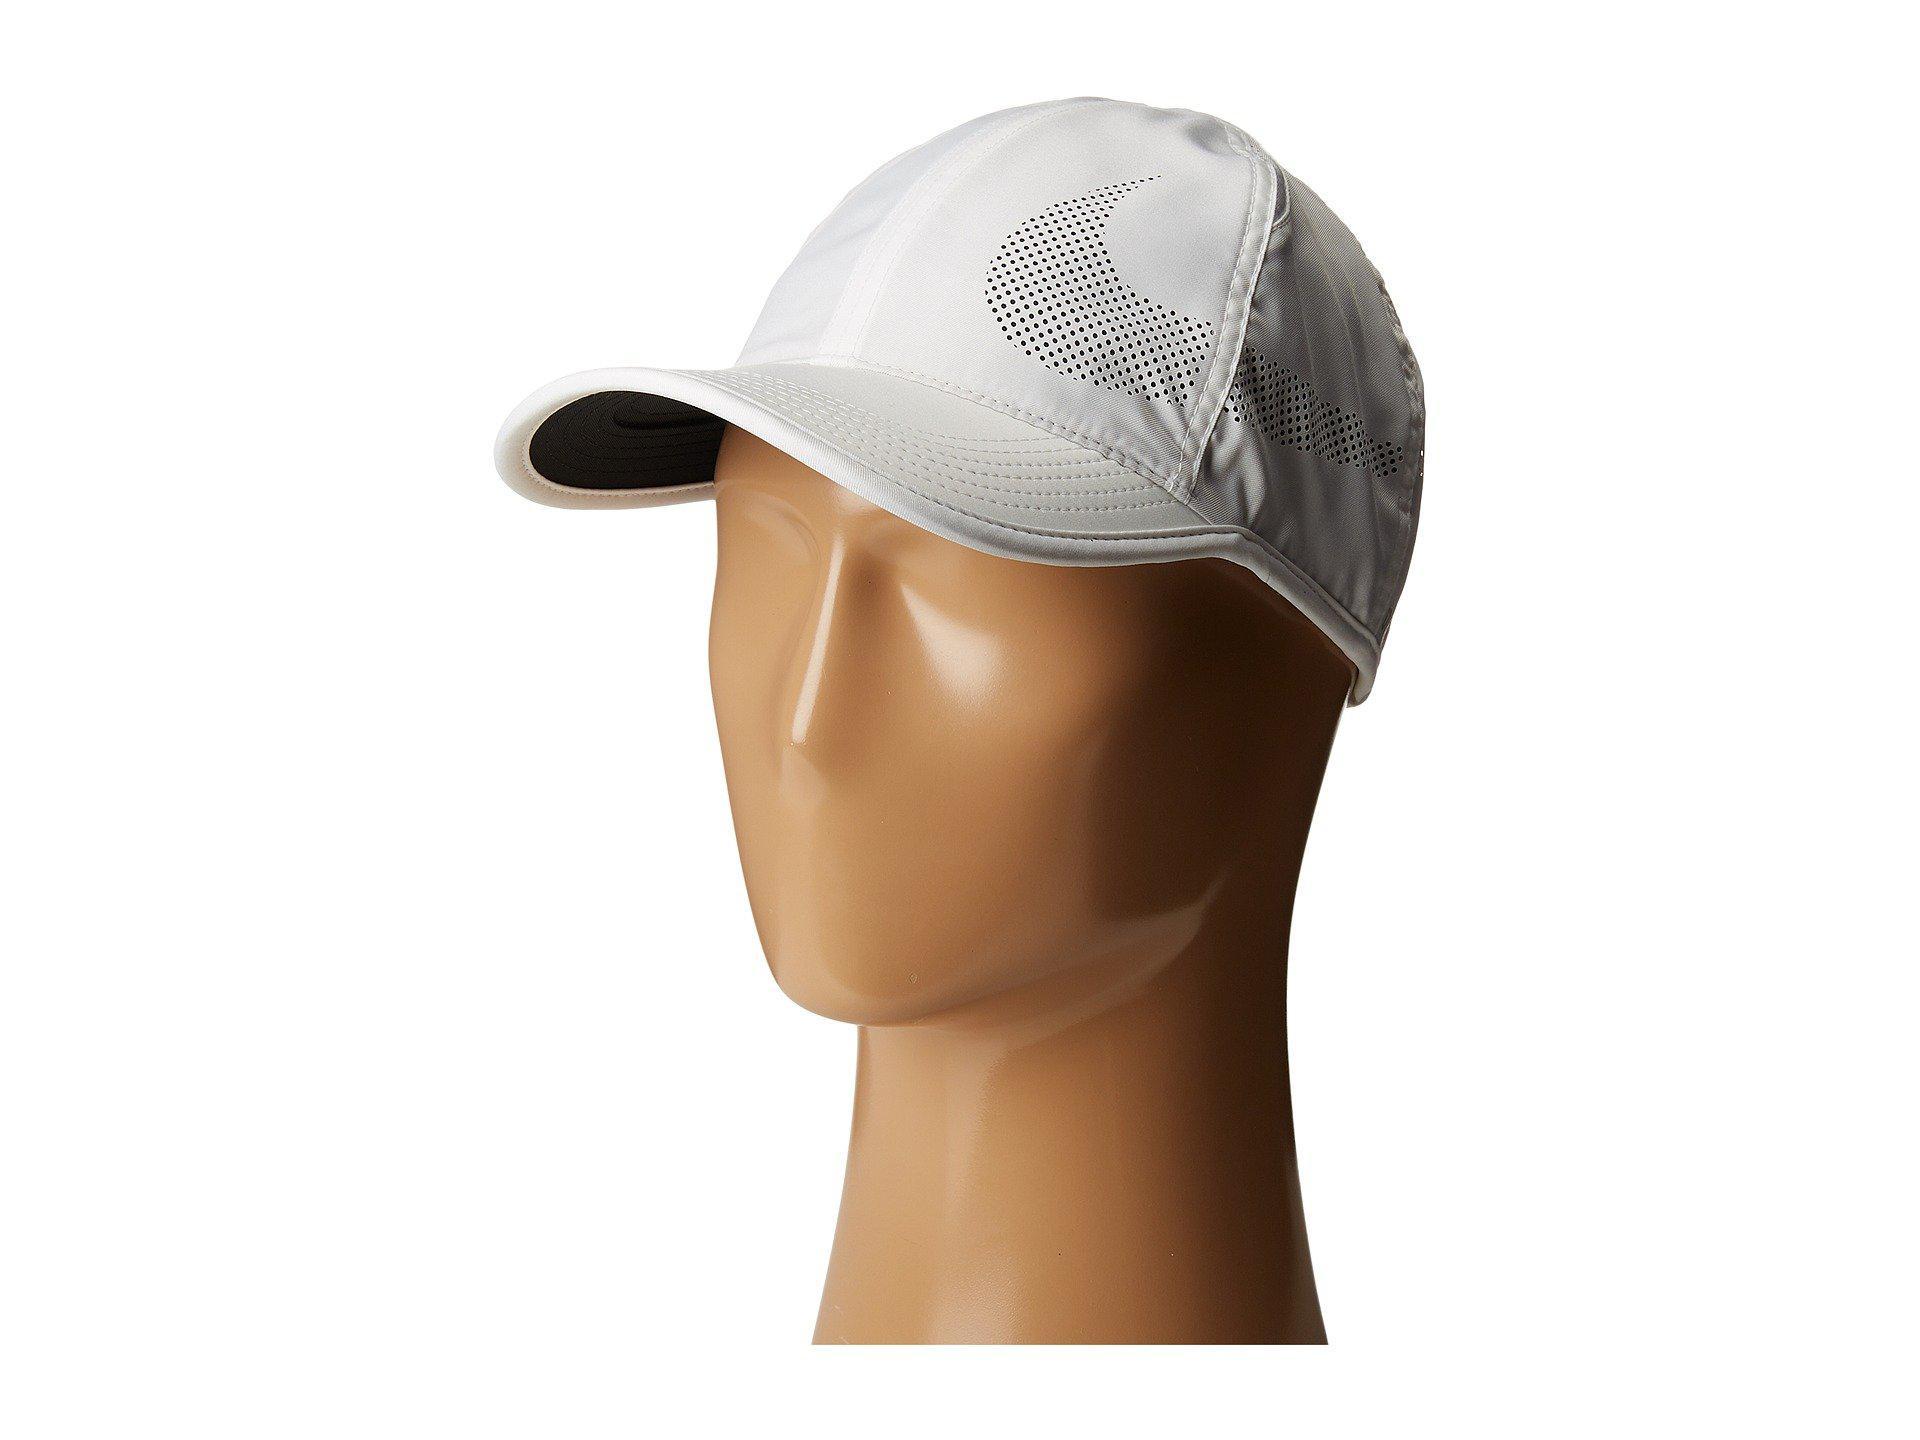 Nike. Men s Court Aerobill Featherlight Tennis Cap (white black black) Caps 2f35ffe749c3